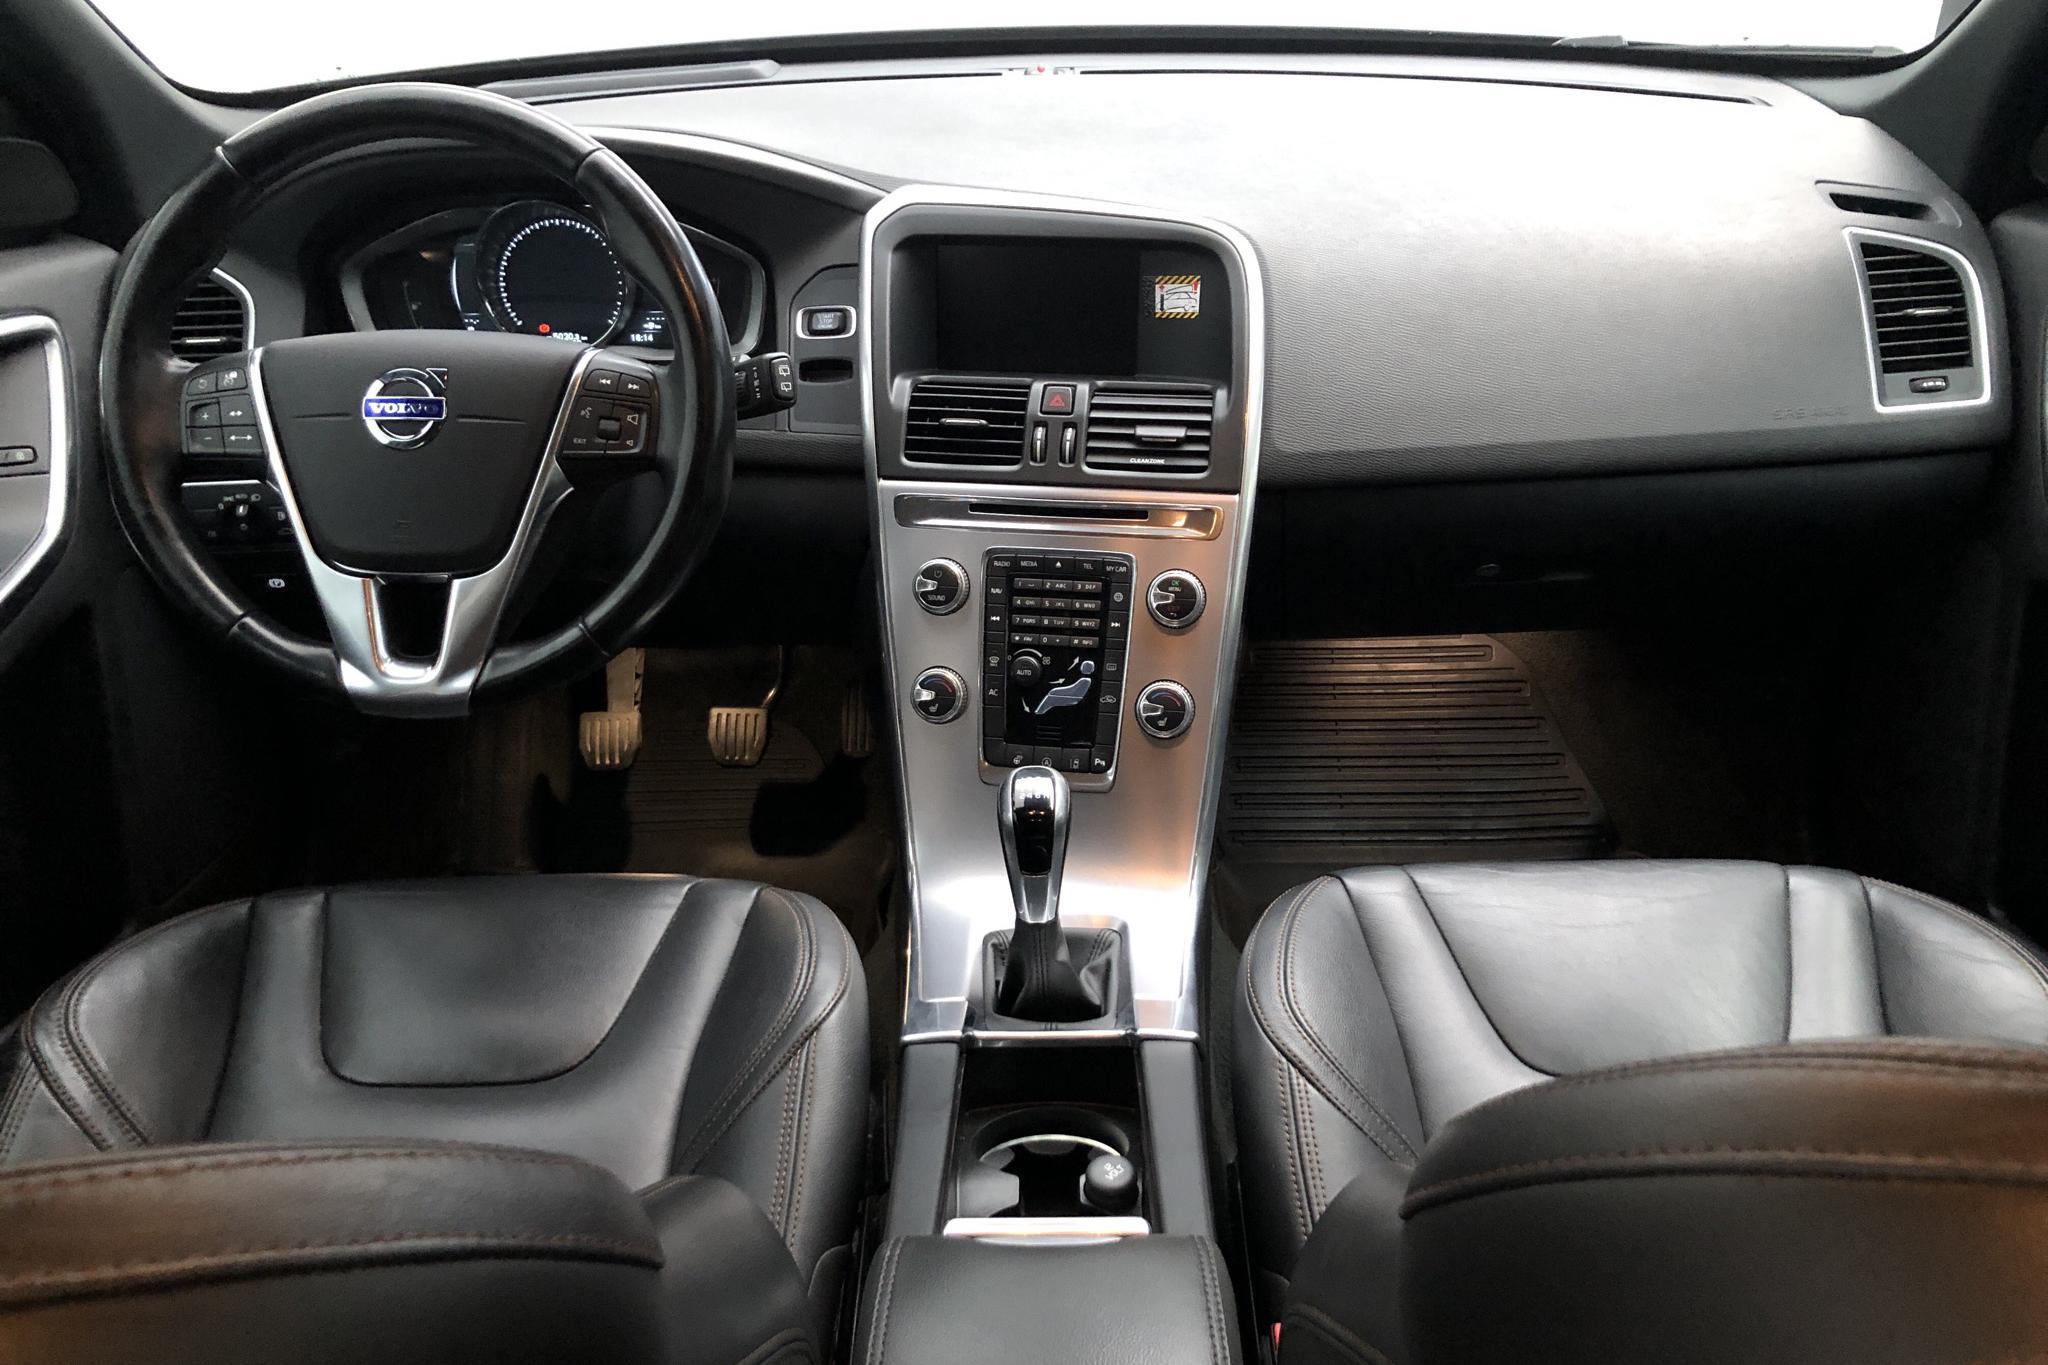 Volvo XC60 D4 2WD (190hk) - 125 020 km - Manual - gray - 2017